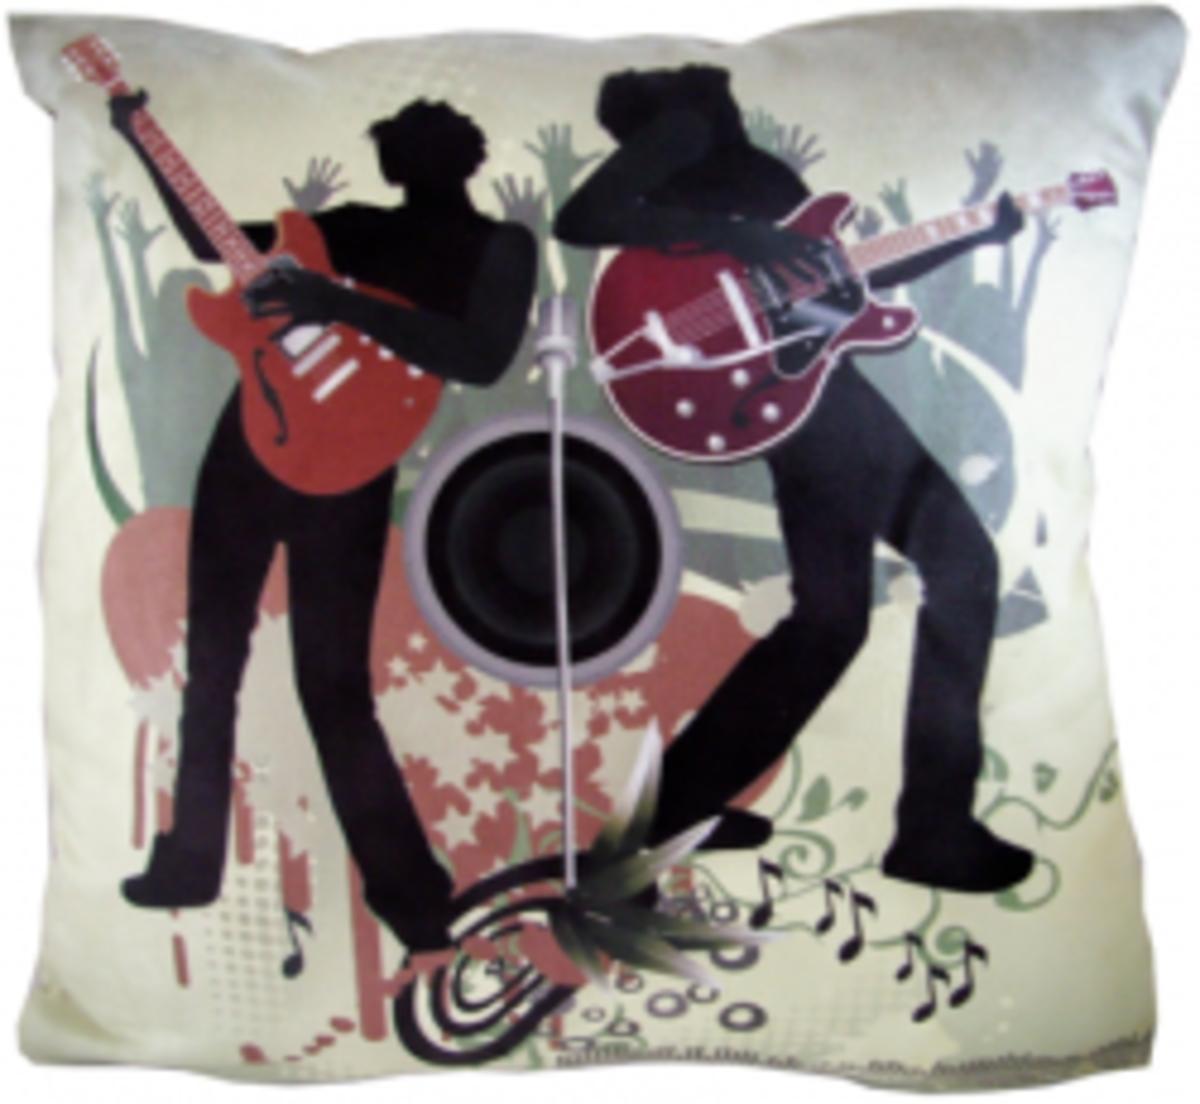 Rock Band Luxury Pillow